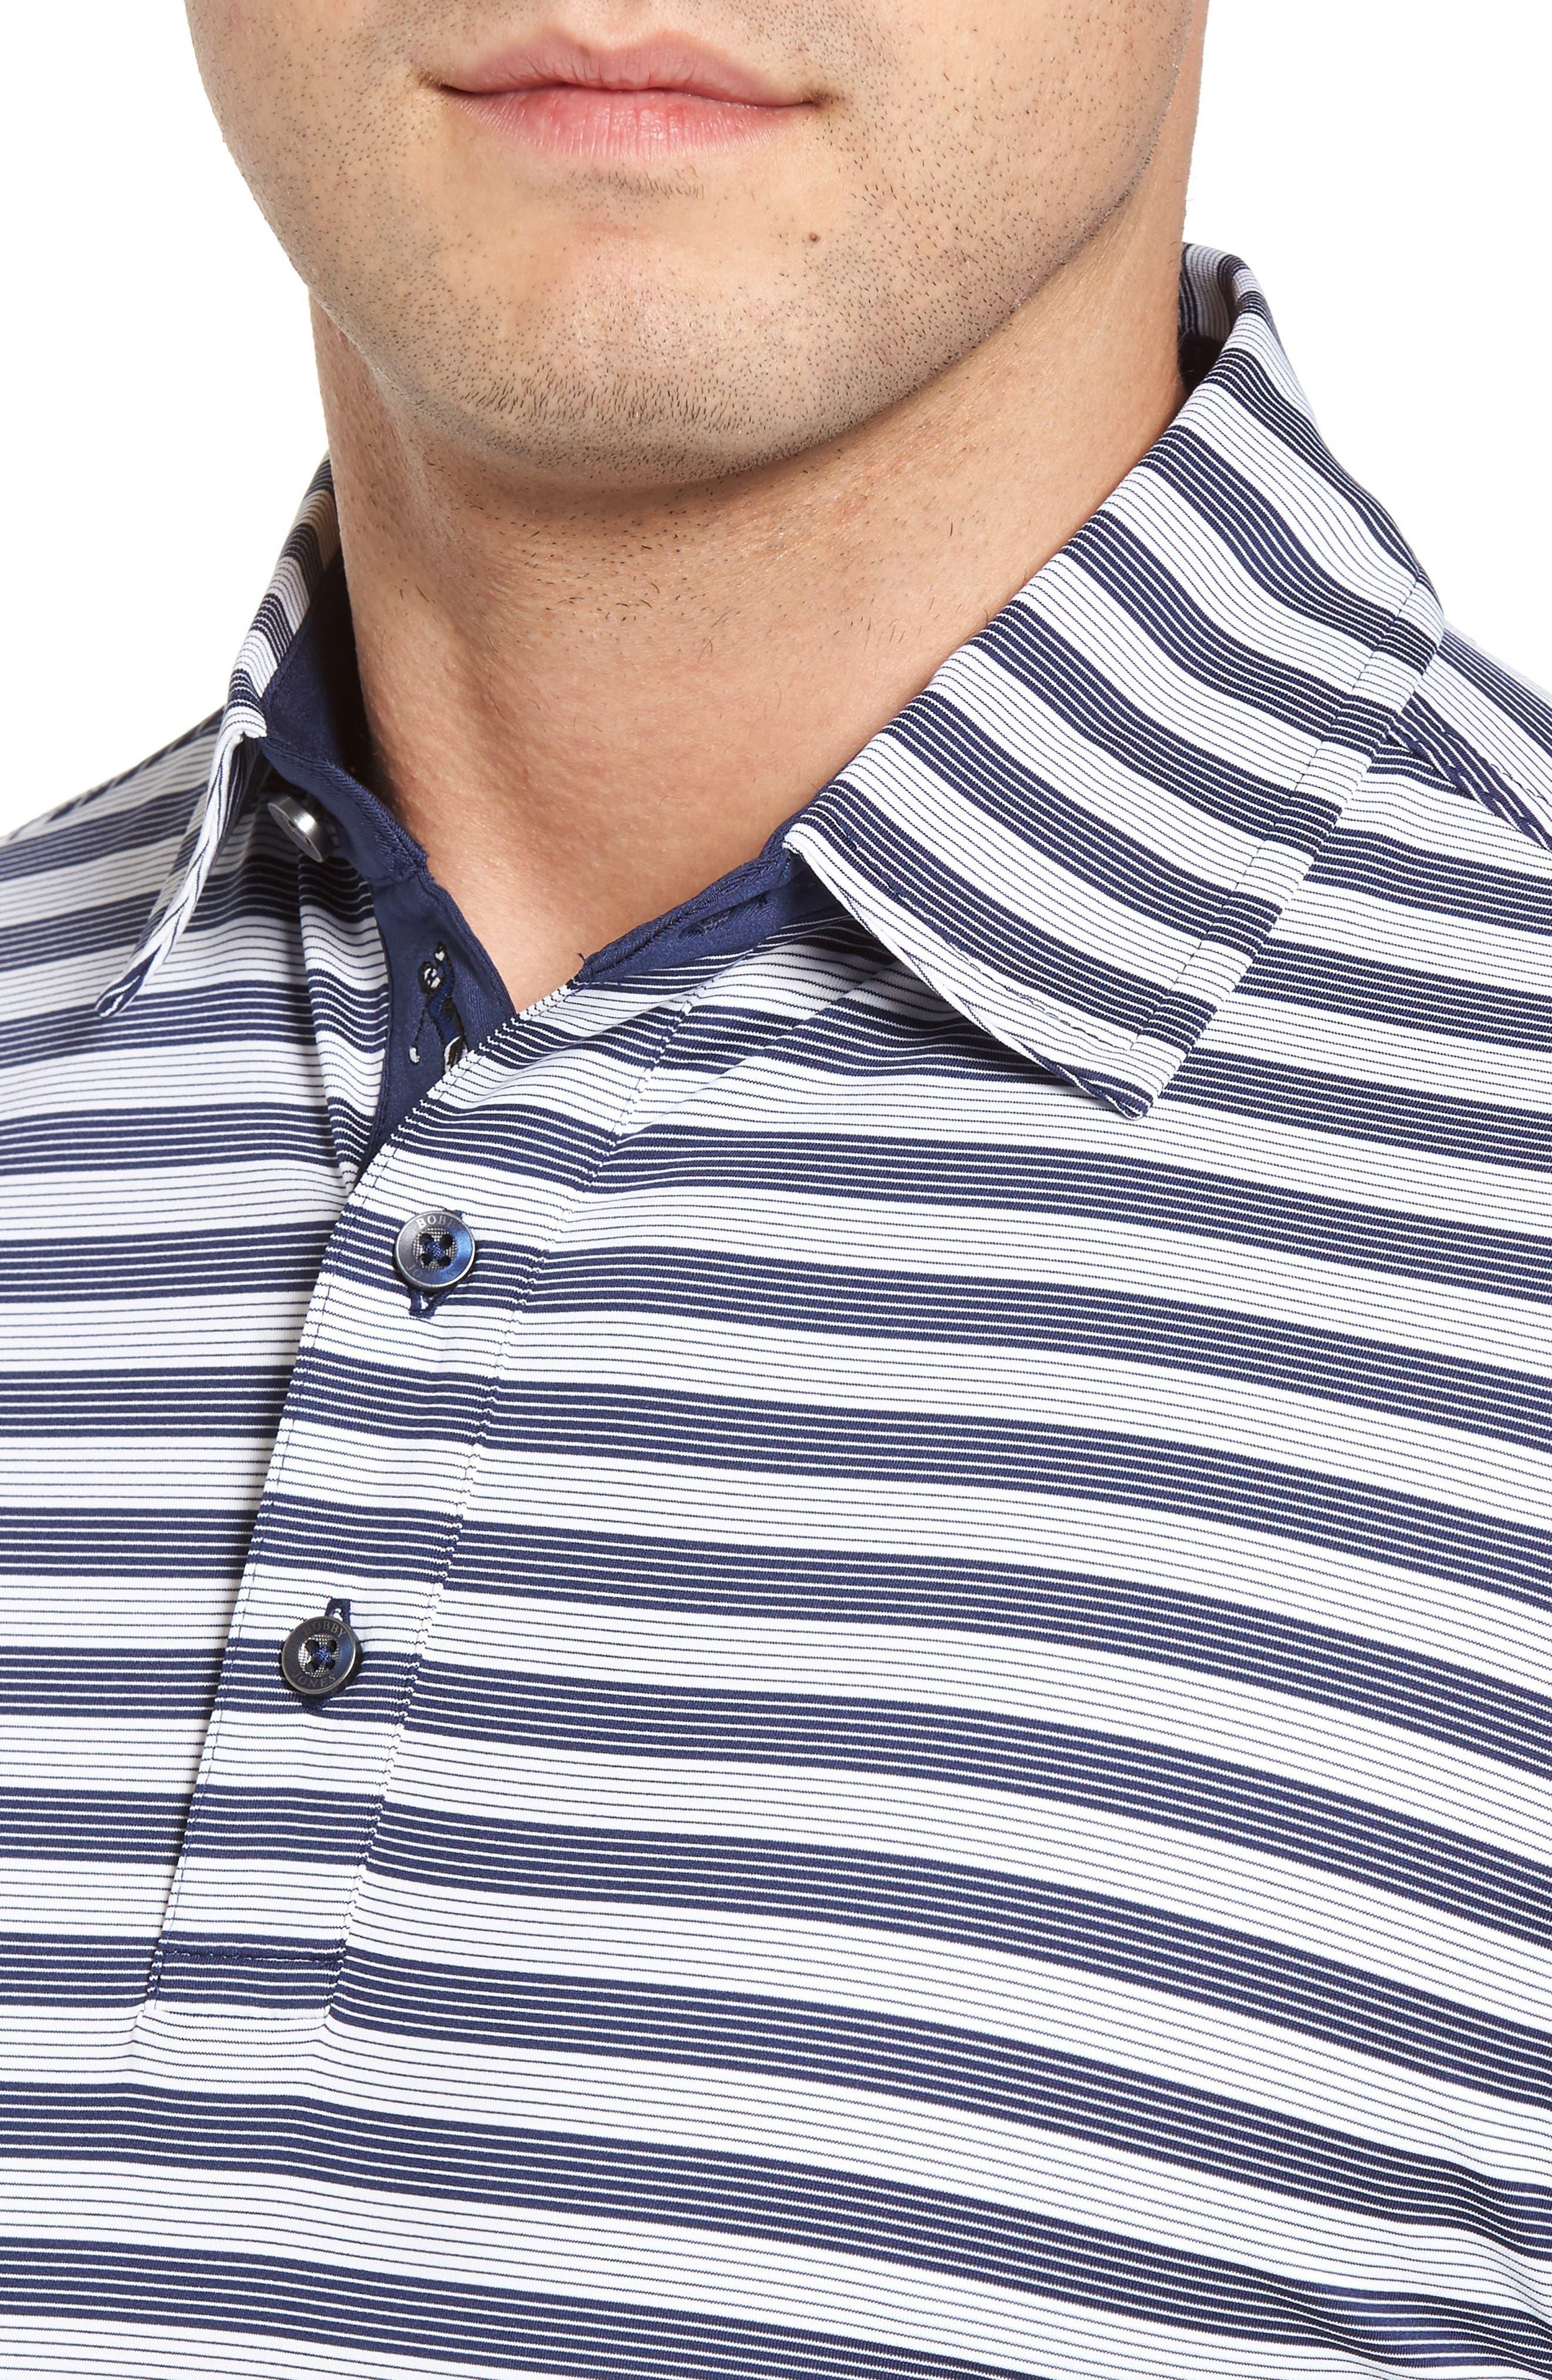 XH2O Del Mar Stripe Jersey Polo,                             Alternate thumbnail 4, color,                             Summer Navy